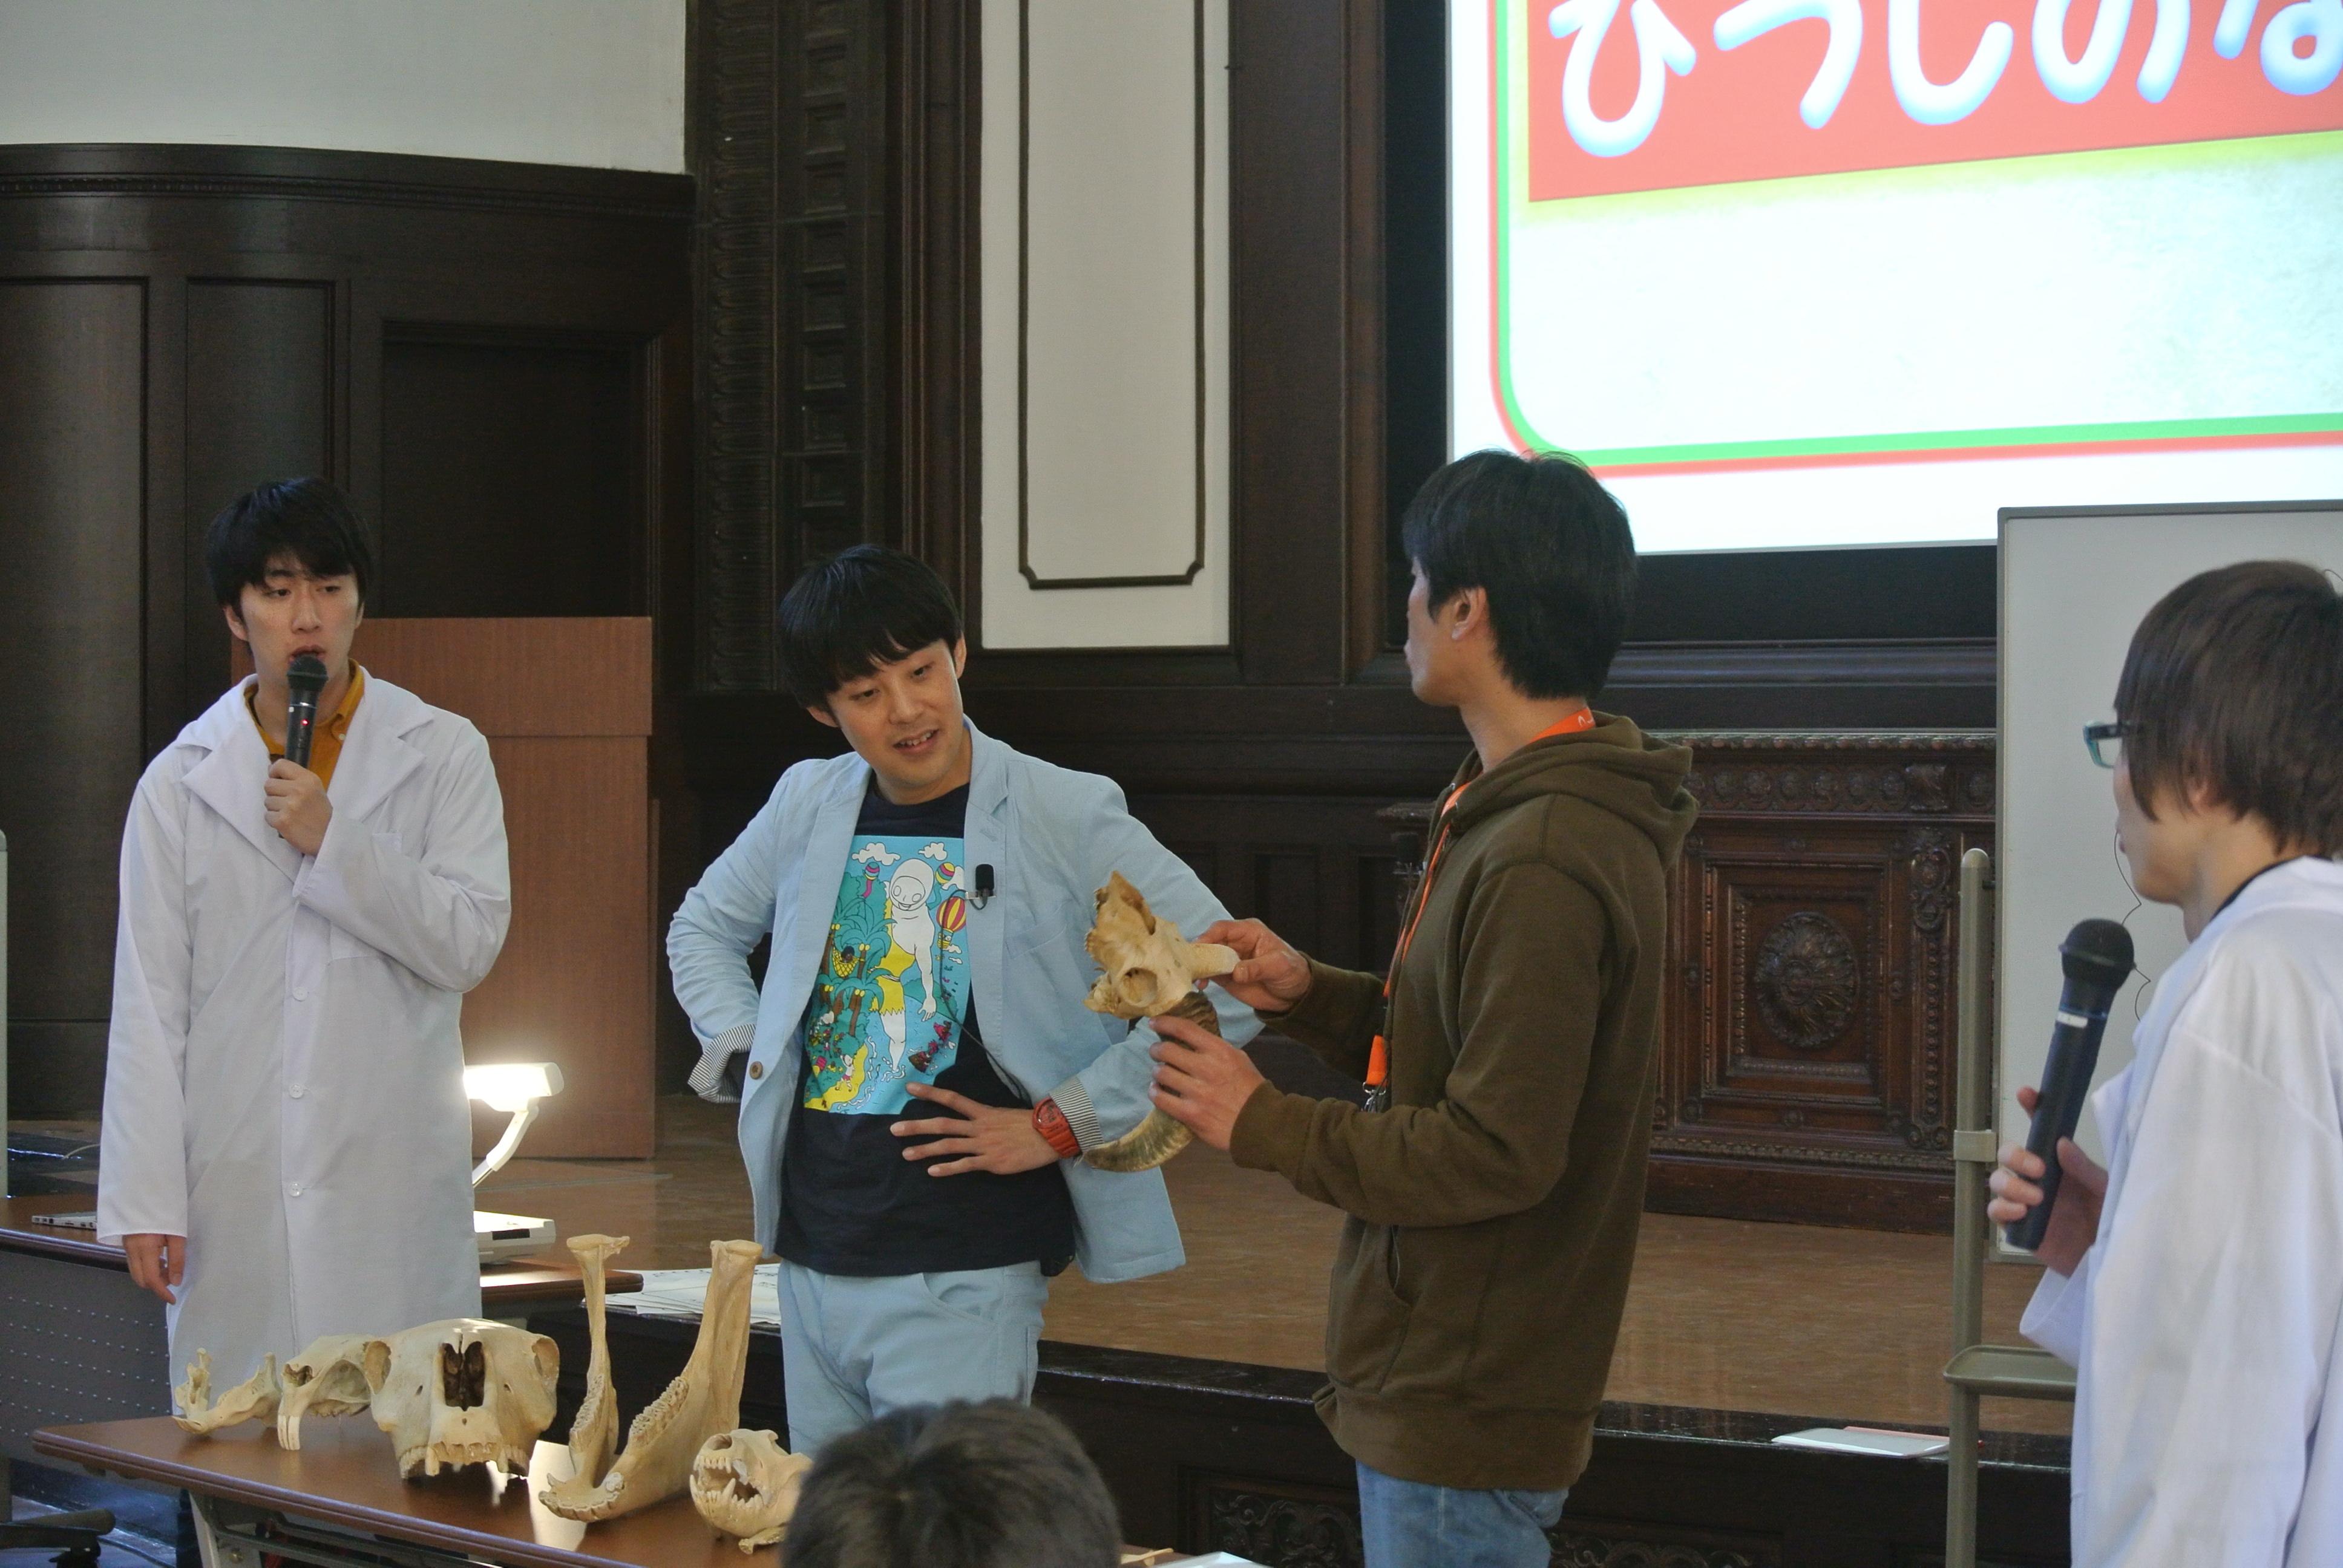 http://news.yoshimoto.co.jp/photos/uncategorized/2014/12/30/20141230185037-3e2ce6d86aadbd243e01ca4f3c45a114c8d4ae84.jpg